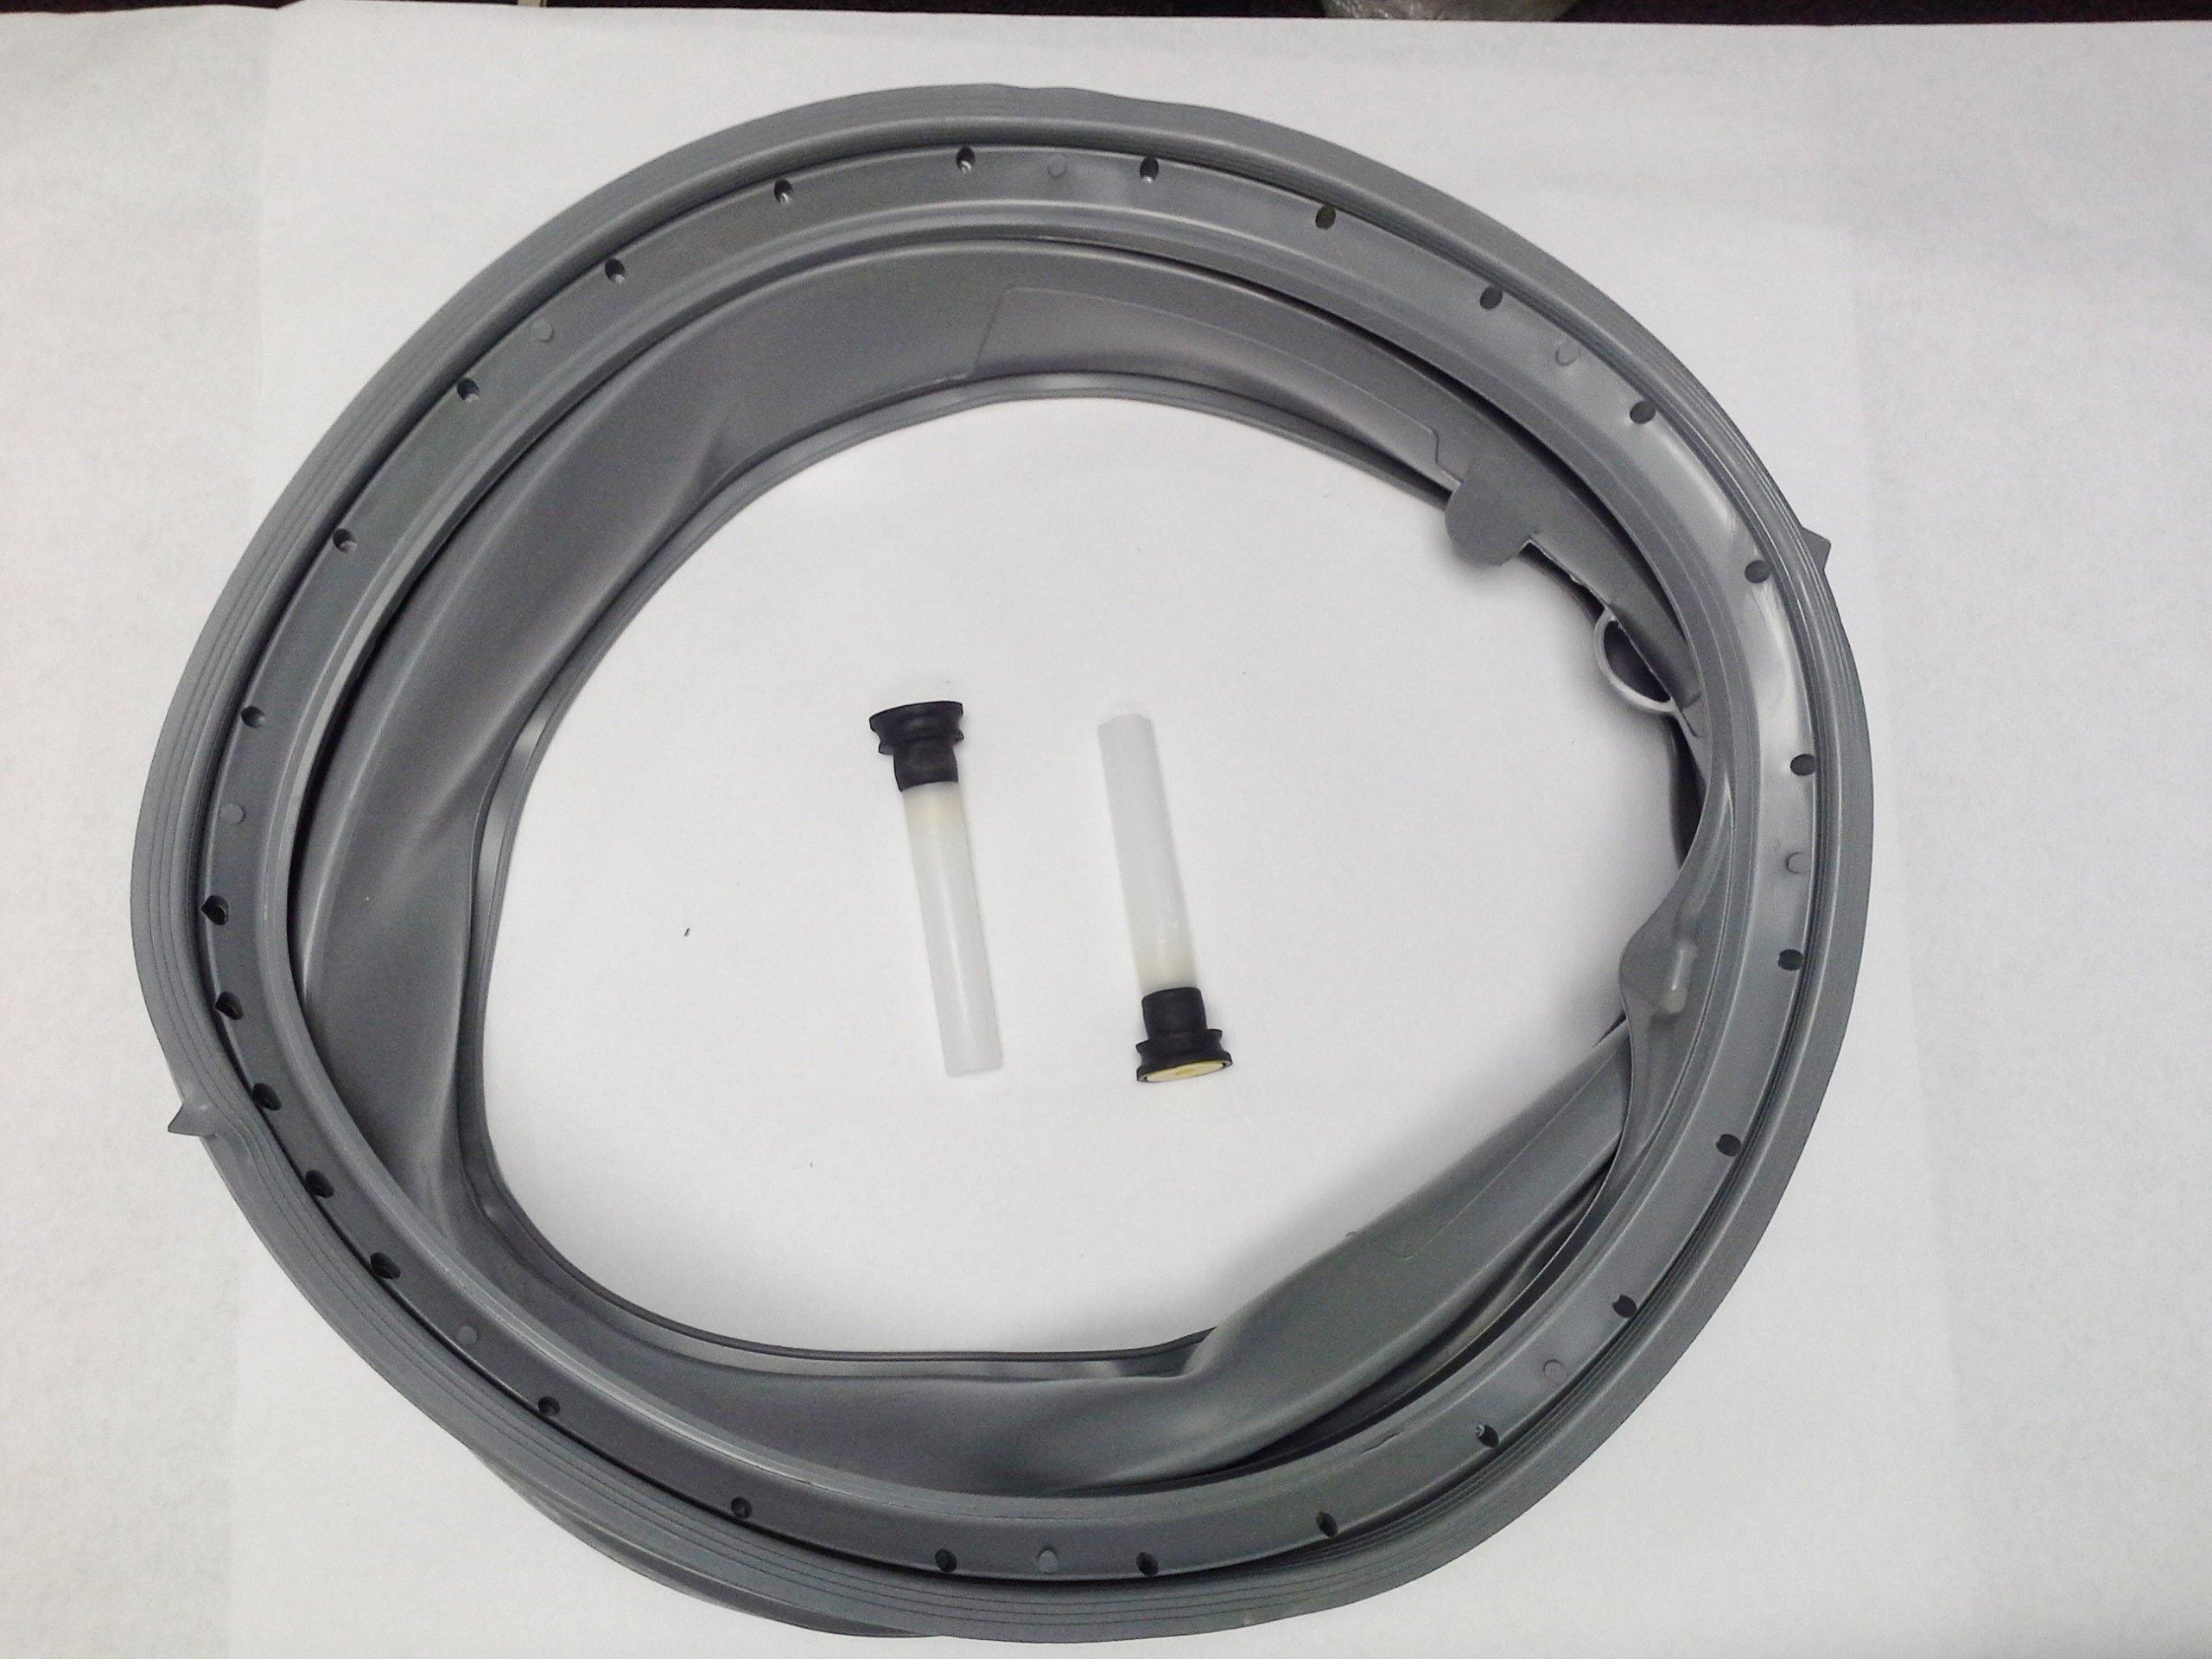 Frigidaire Washer Front Load Door Rubber seal gasket 134515300-FR by 134515300-FR